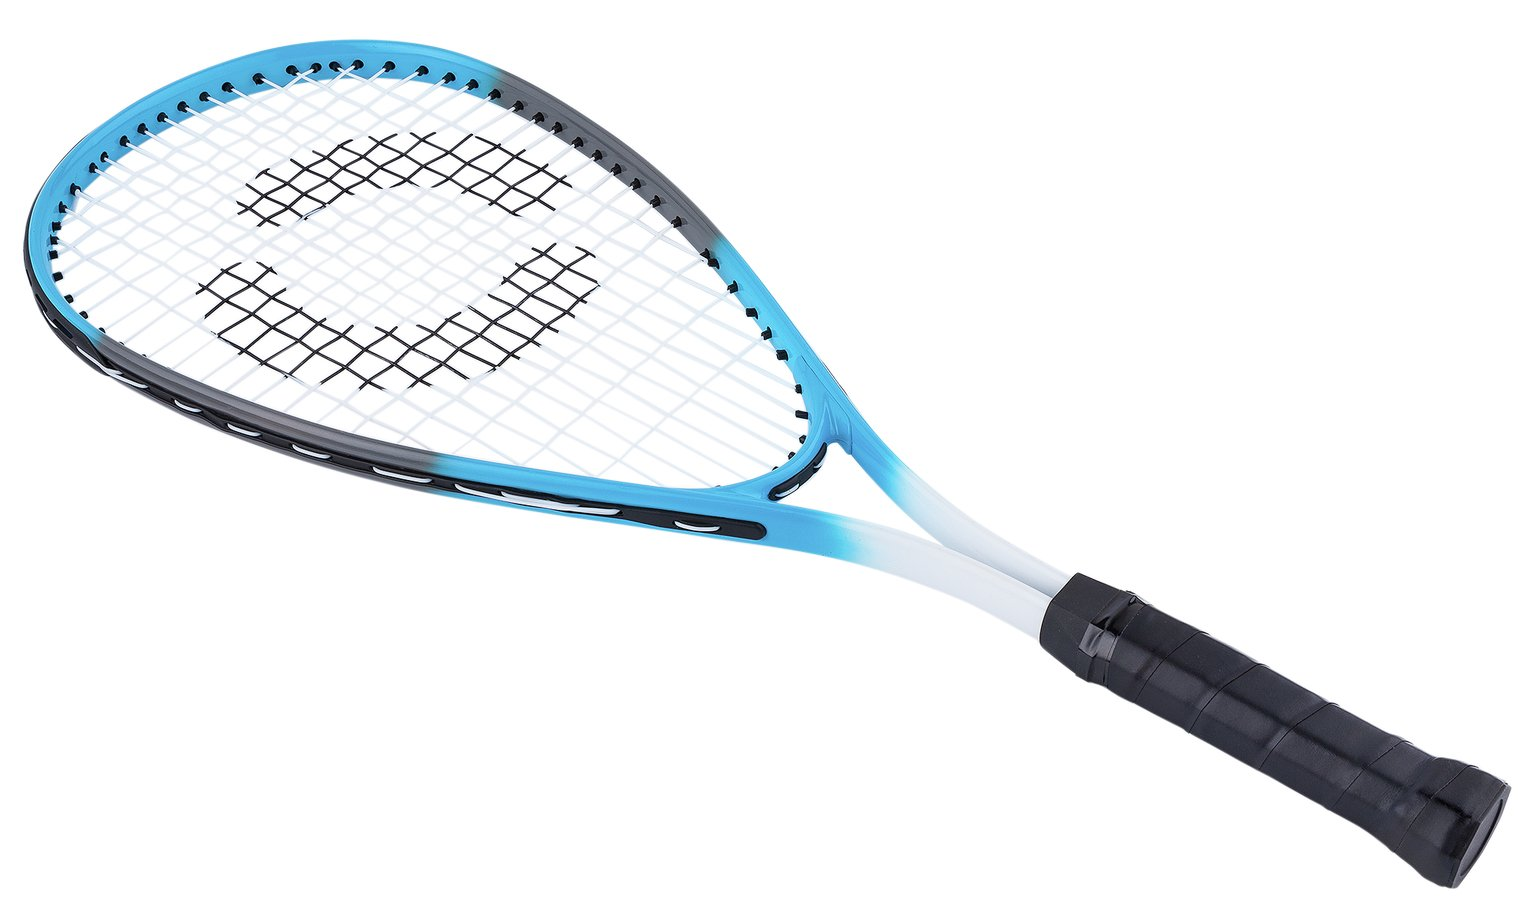 Opti Squash Racket